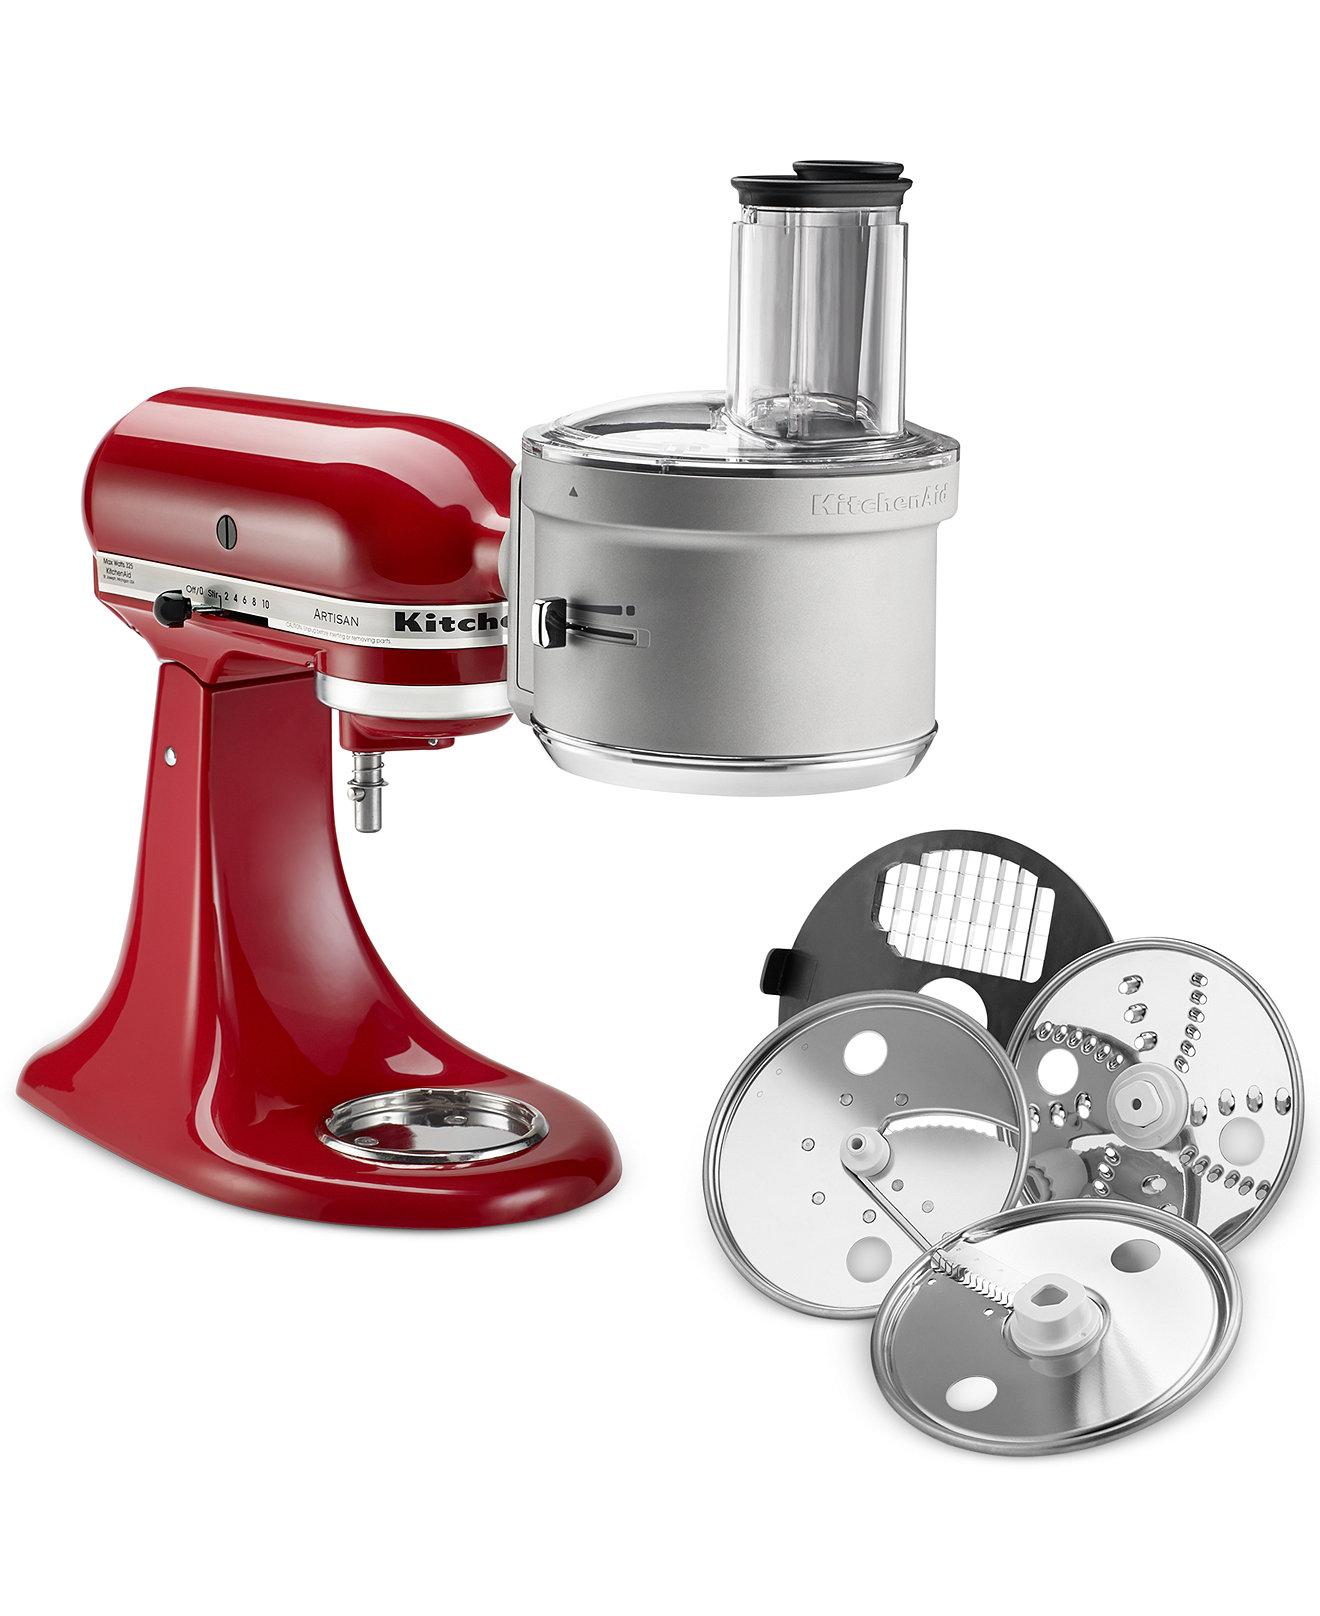 KitchenAid KSM2FPA Stand Mixer ExactSlice Food Processor ...